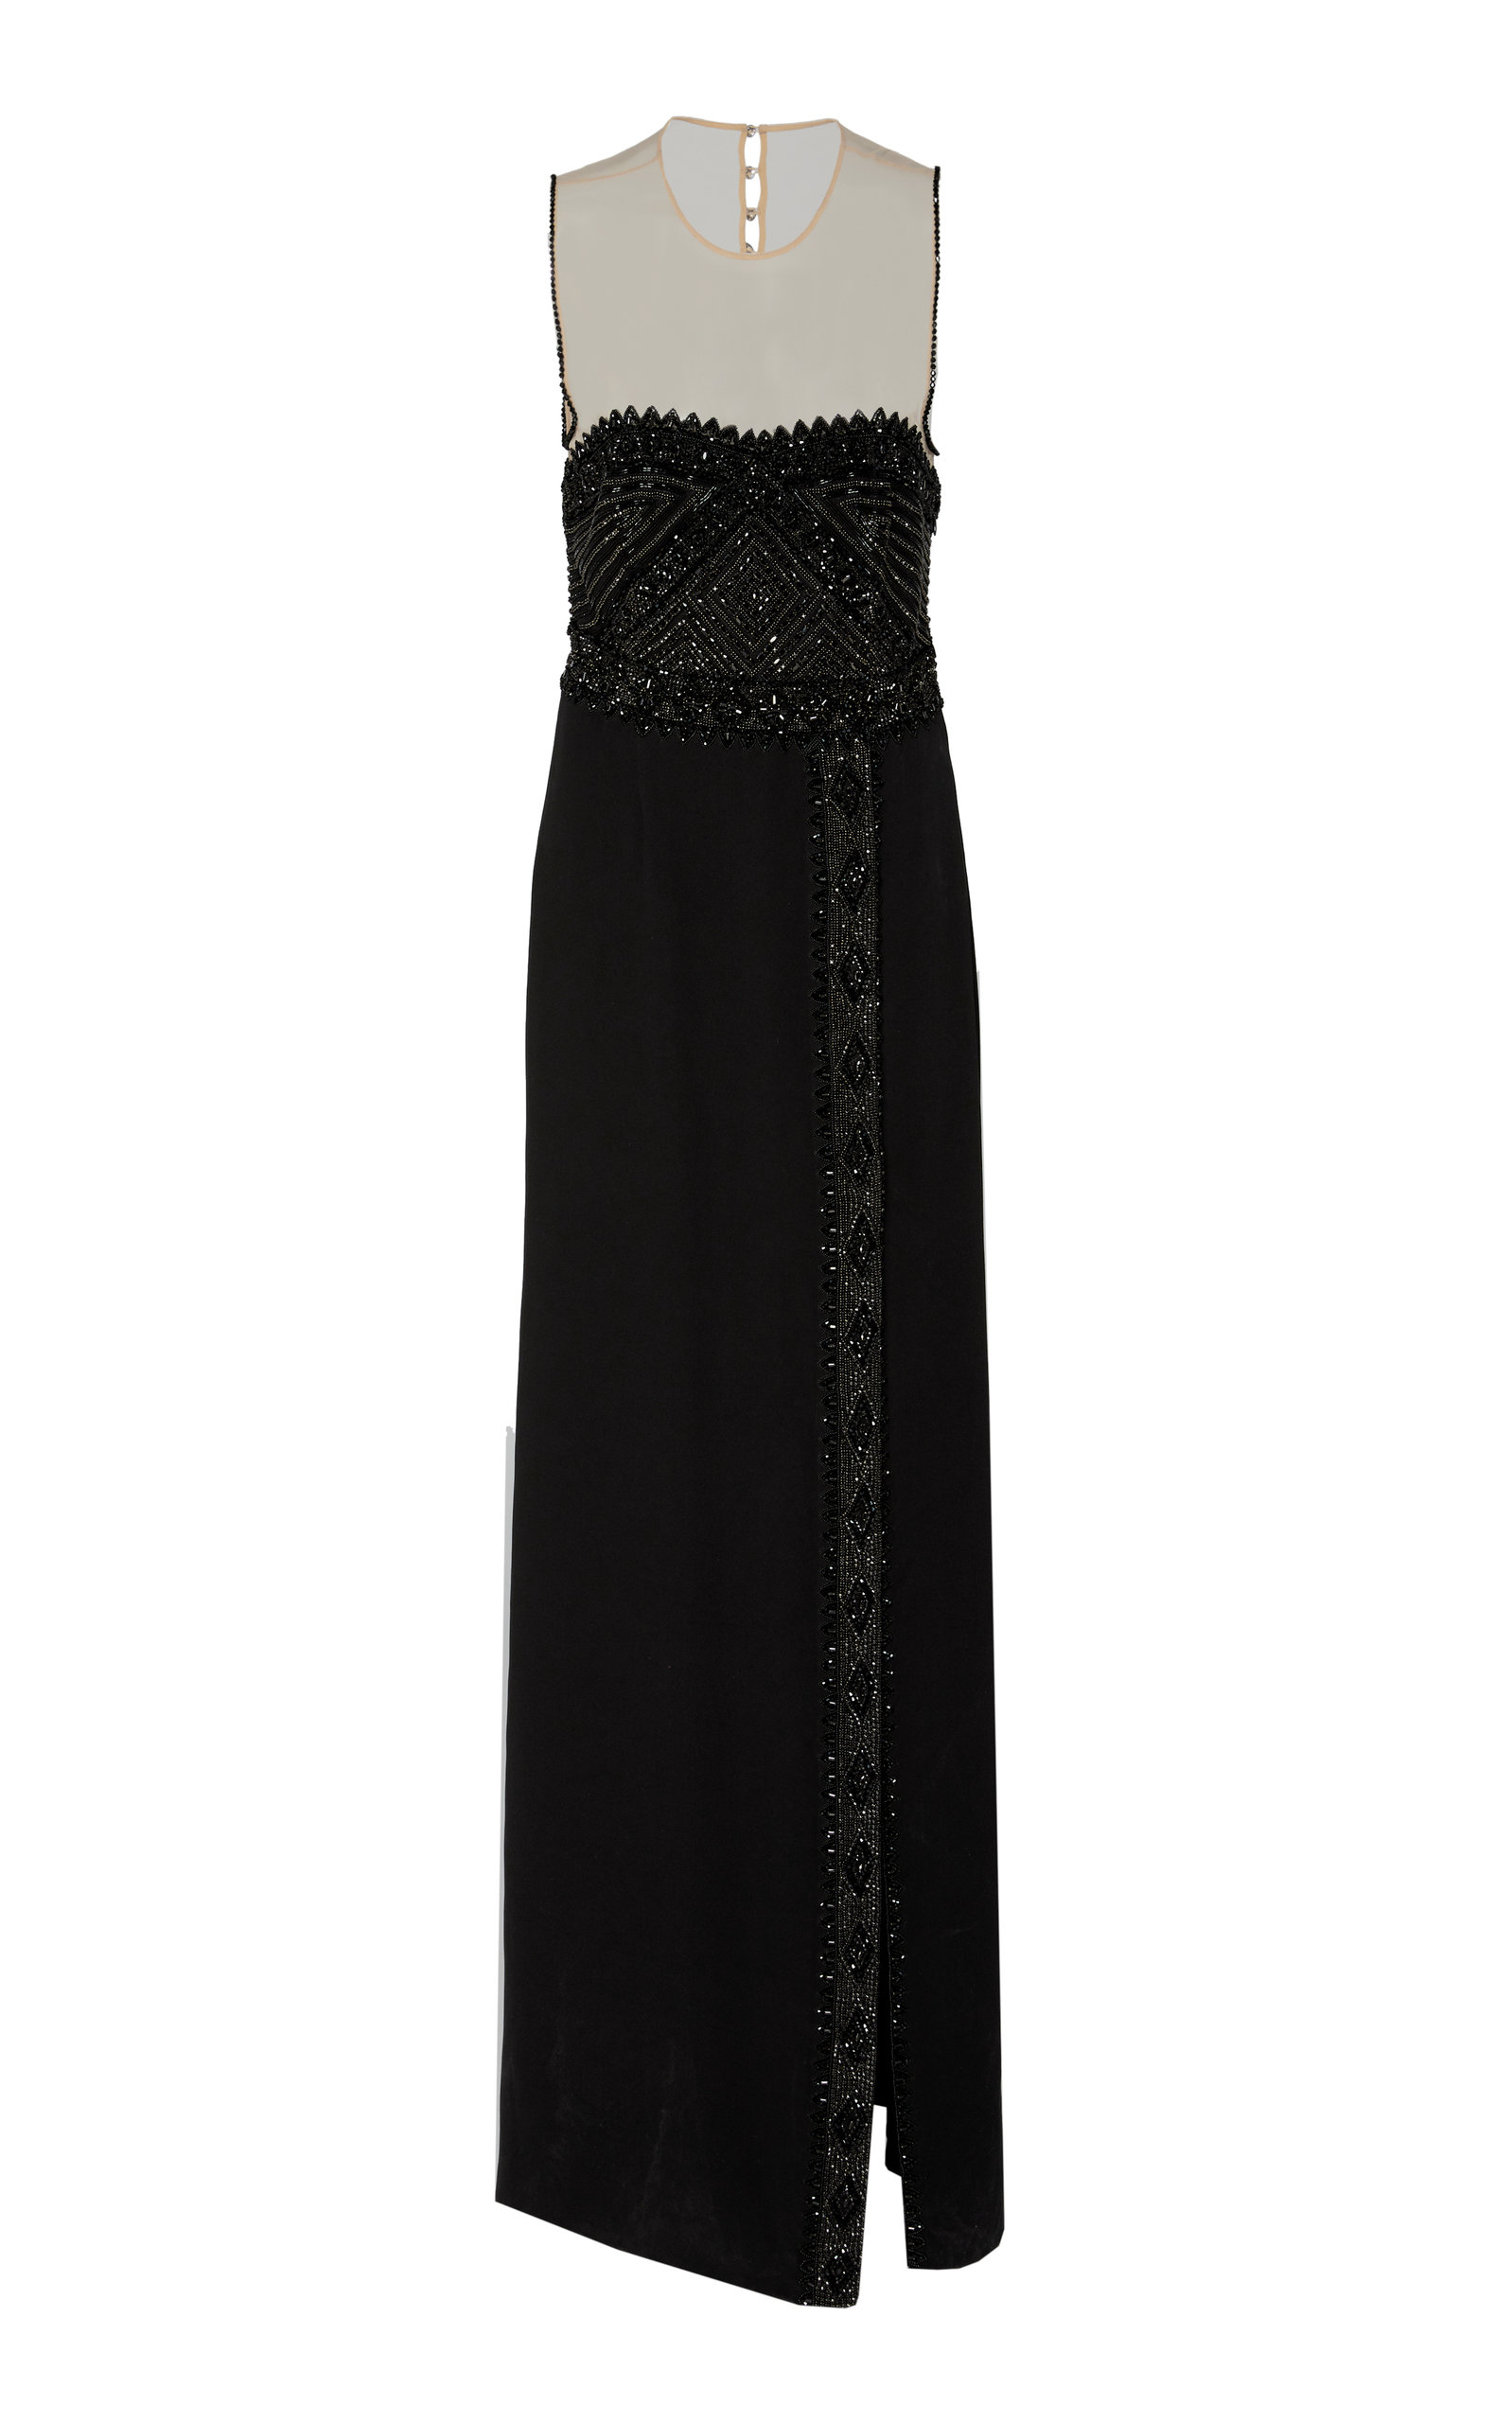 CUCCULELLI SHAHEEN Clea Silk Gown in Black